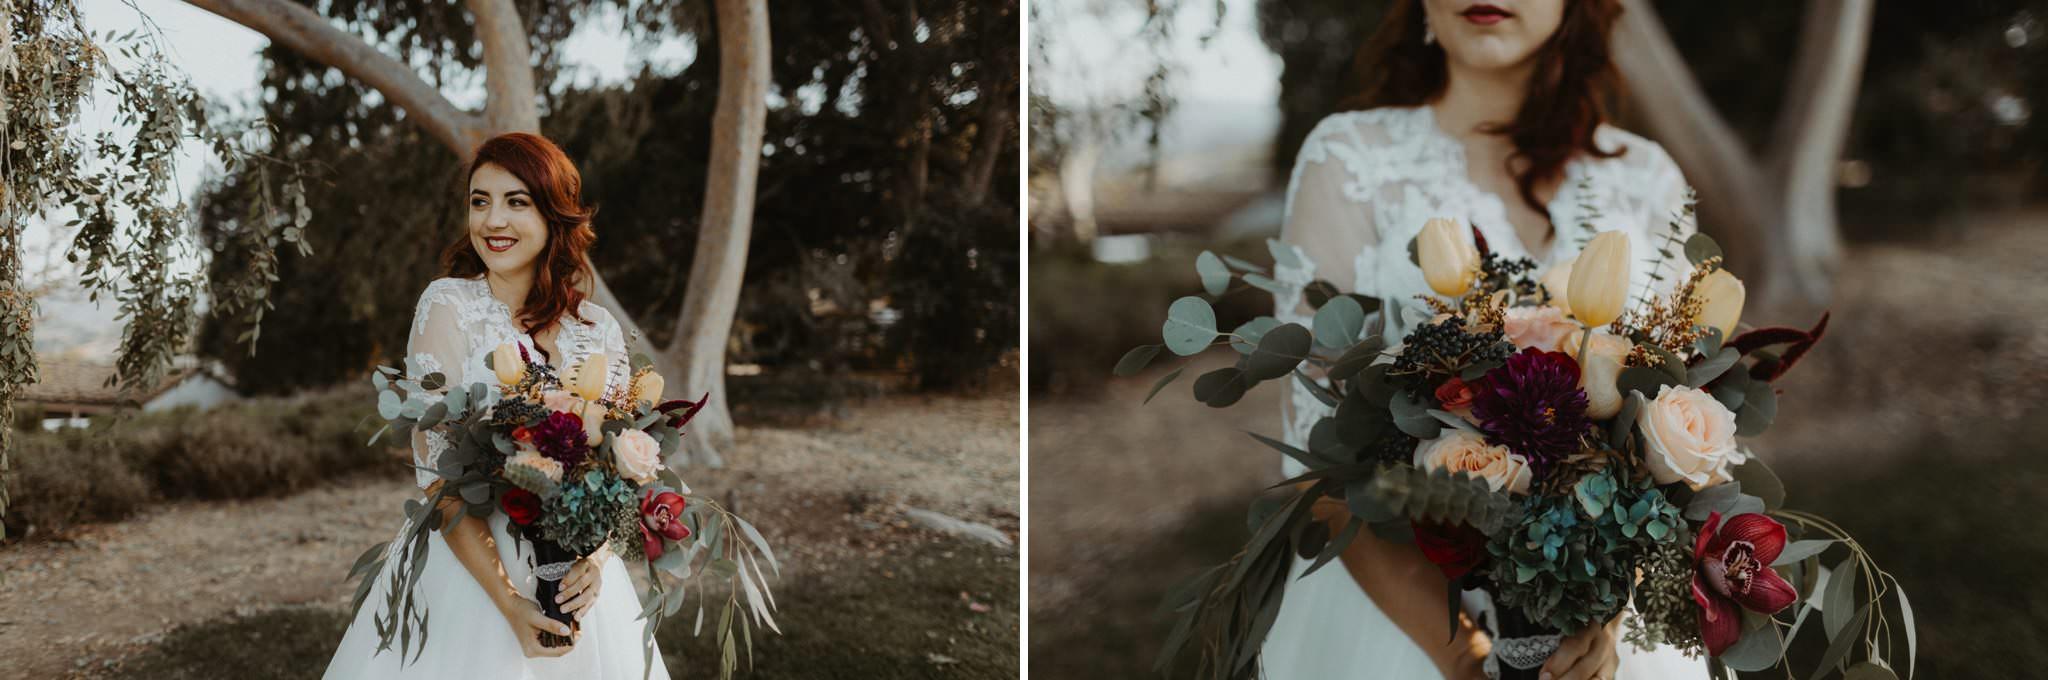 simi valley wedding photography 067